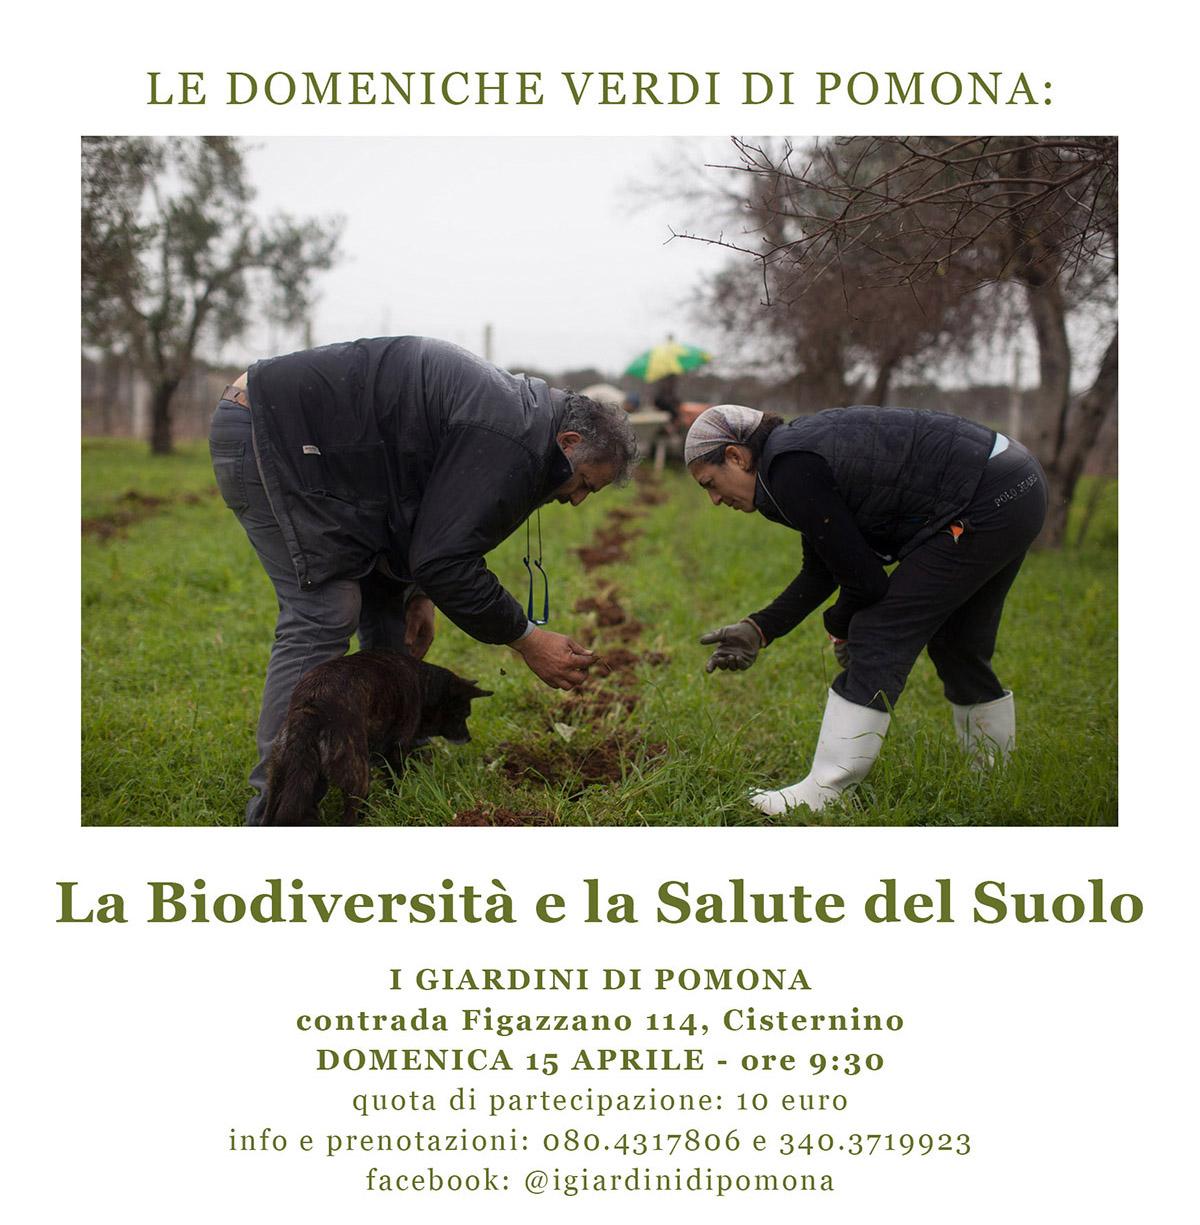 Cisternino, 15 aprile 2018